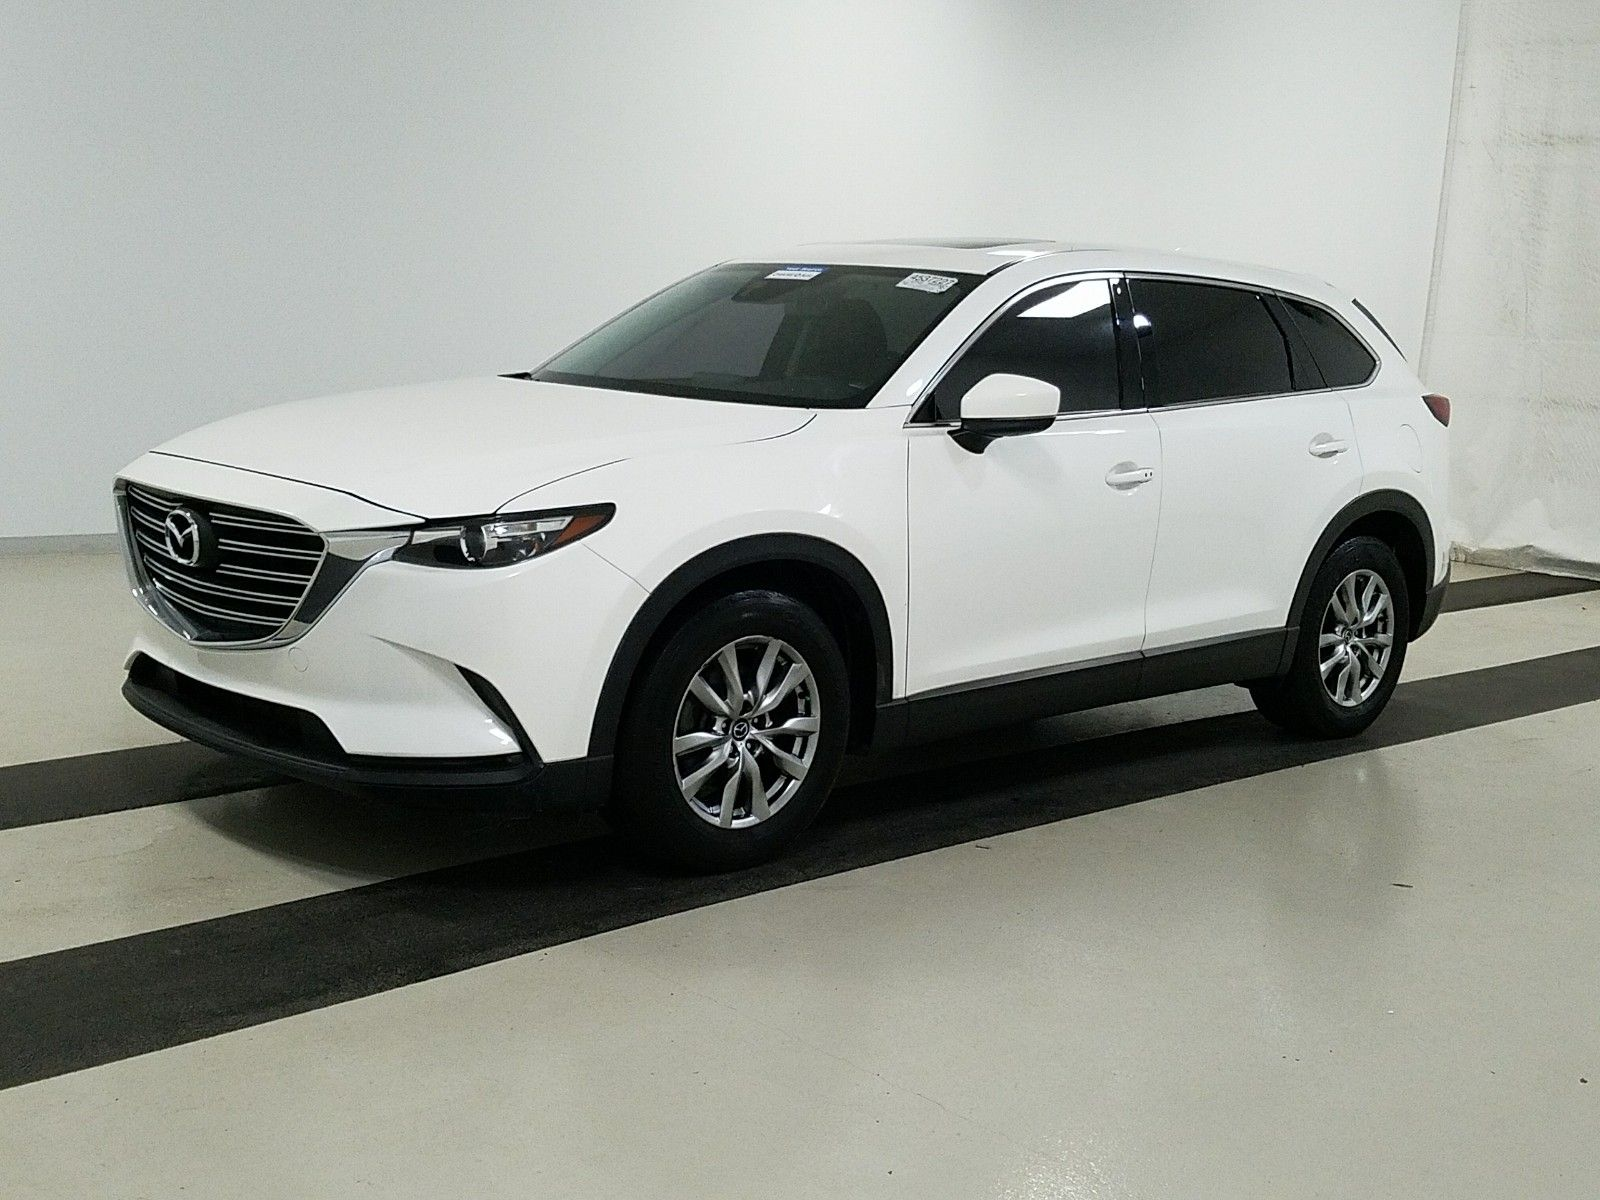 2017 Mazda Cx-9 2.5. Lot 99915980540 Vin JM3TCACY2H0138332